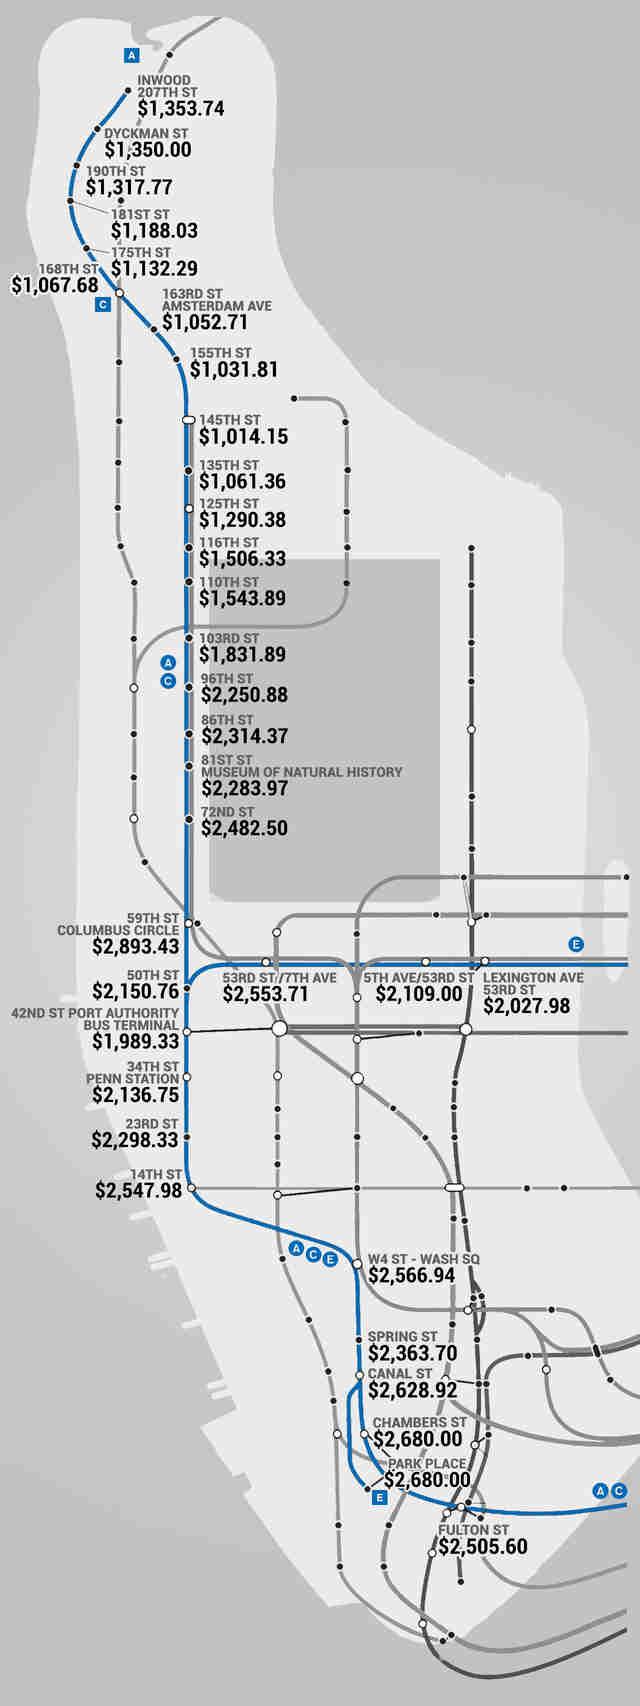 Subway Map From 88 St To 59th Street.Manhattan Subway Rent Map Thrillist